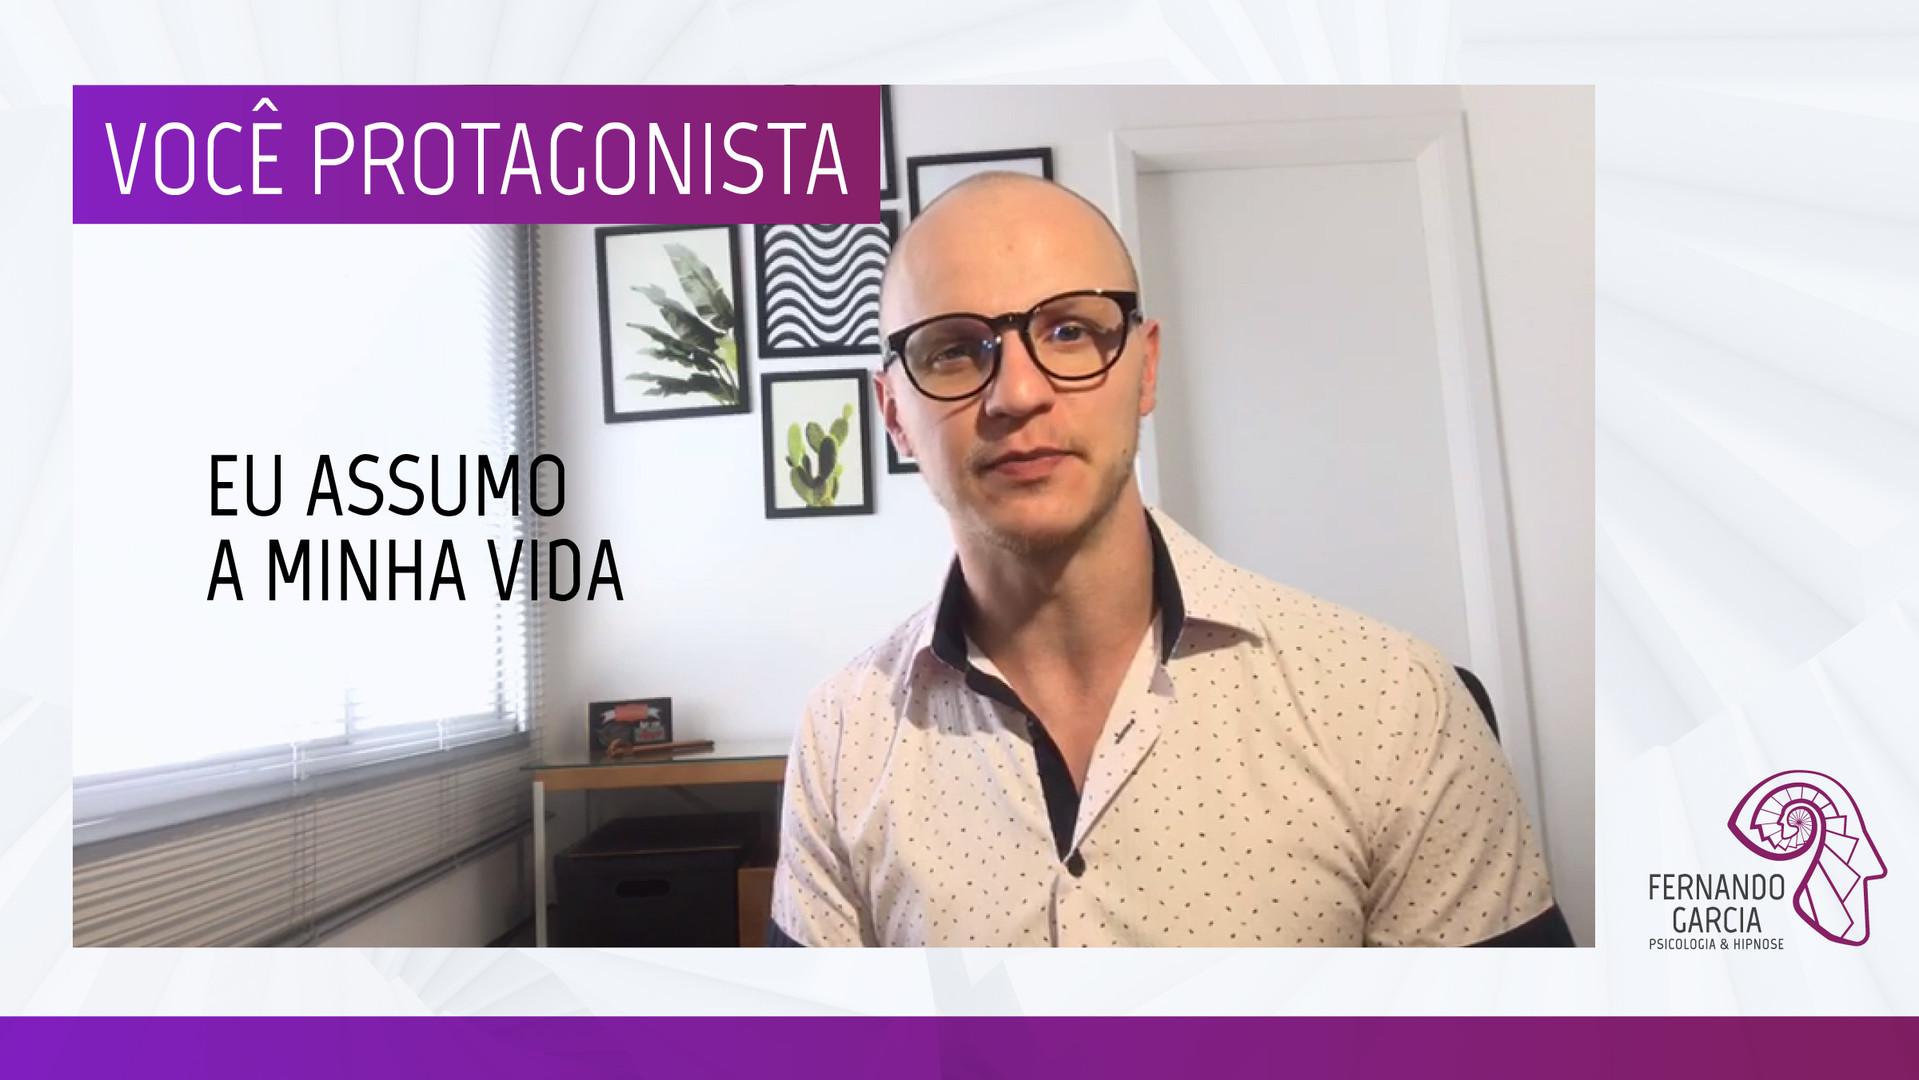 Fernando Garcia - Psicologia & Hipnose